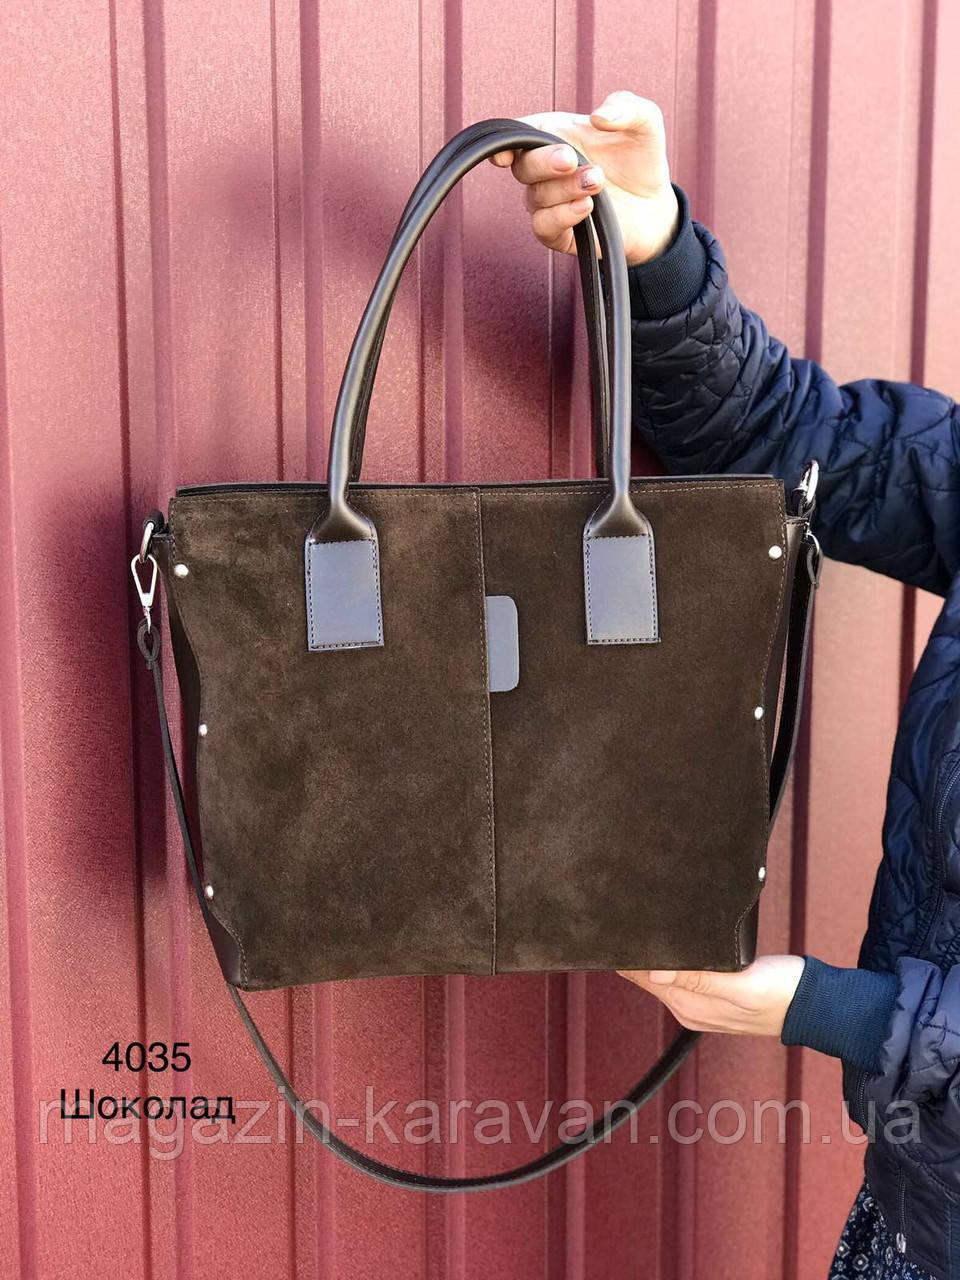 Женская сумка натуральная замша и кожзам в 6 цветах